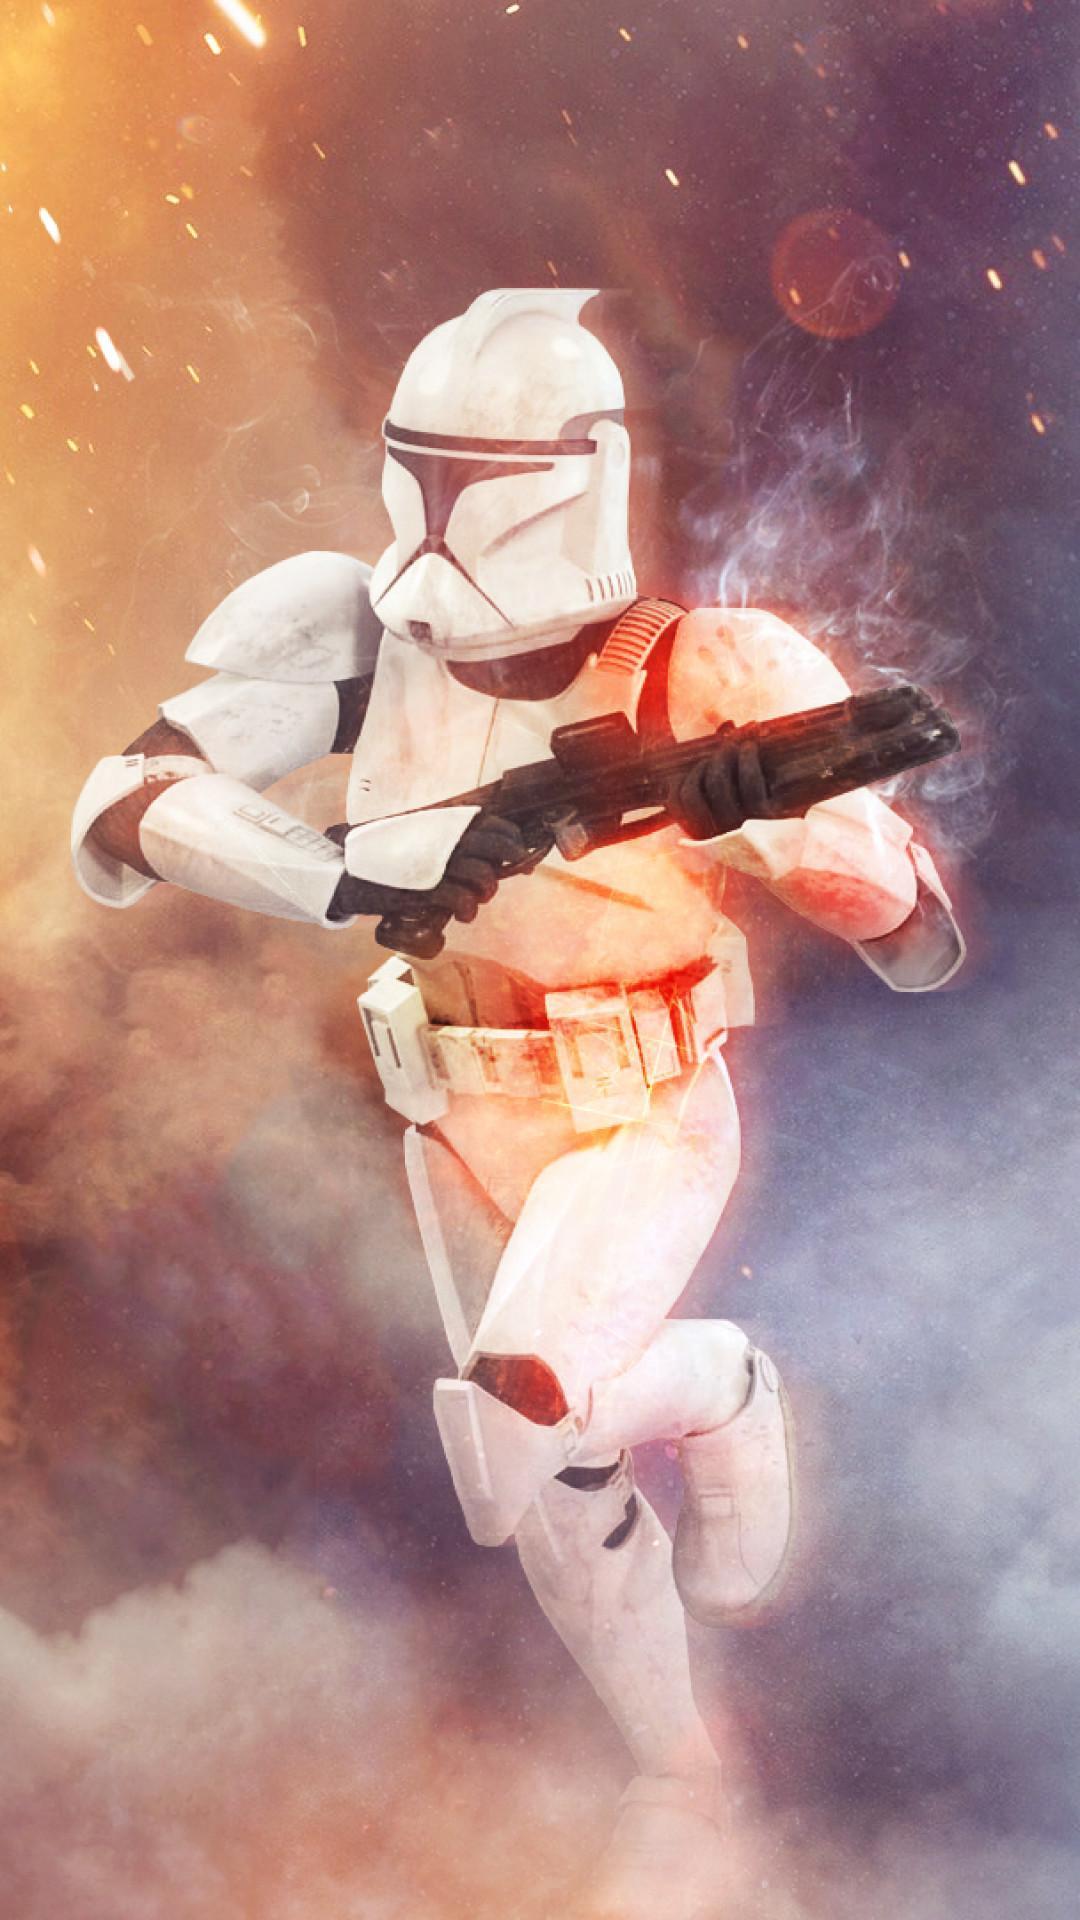 Clones Star Wars Iphone Wallpapers Top Free Clones Star Wars Iphone Backgrounds Wallpaperaccess